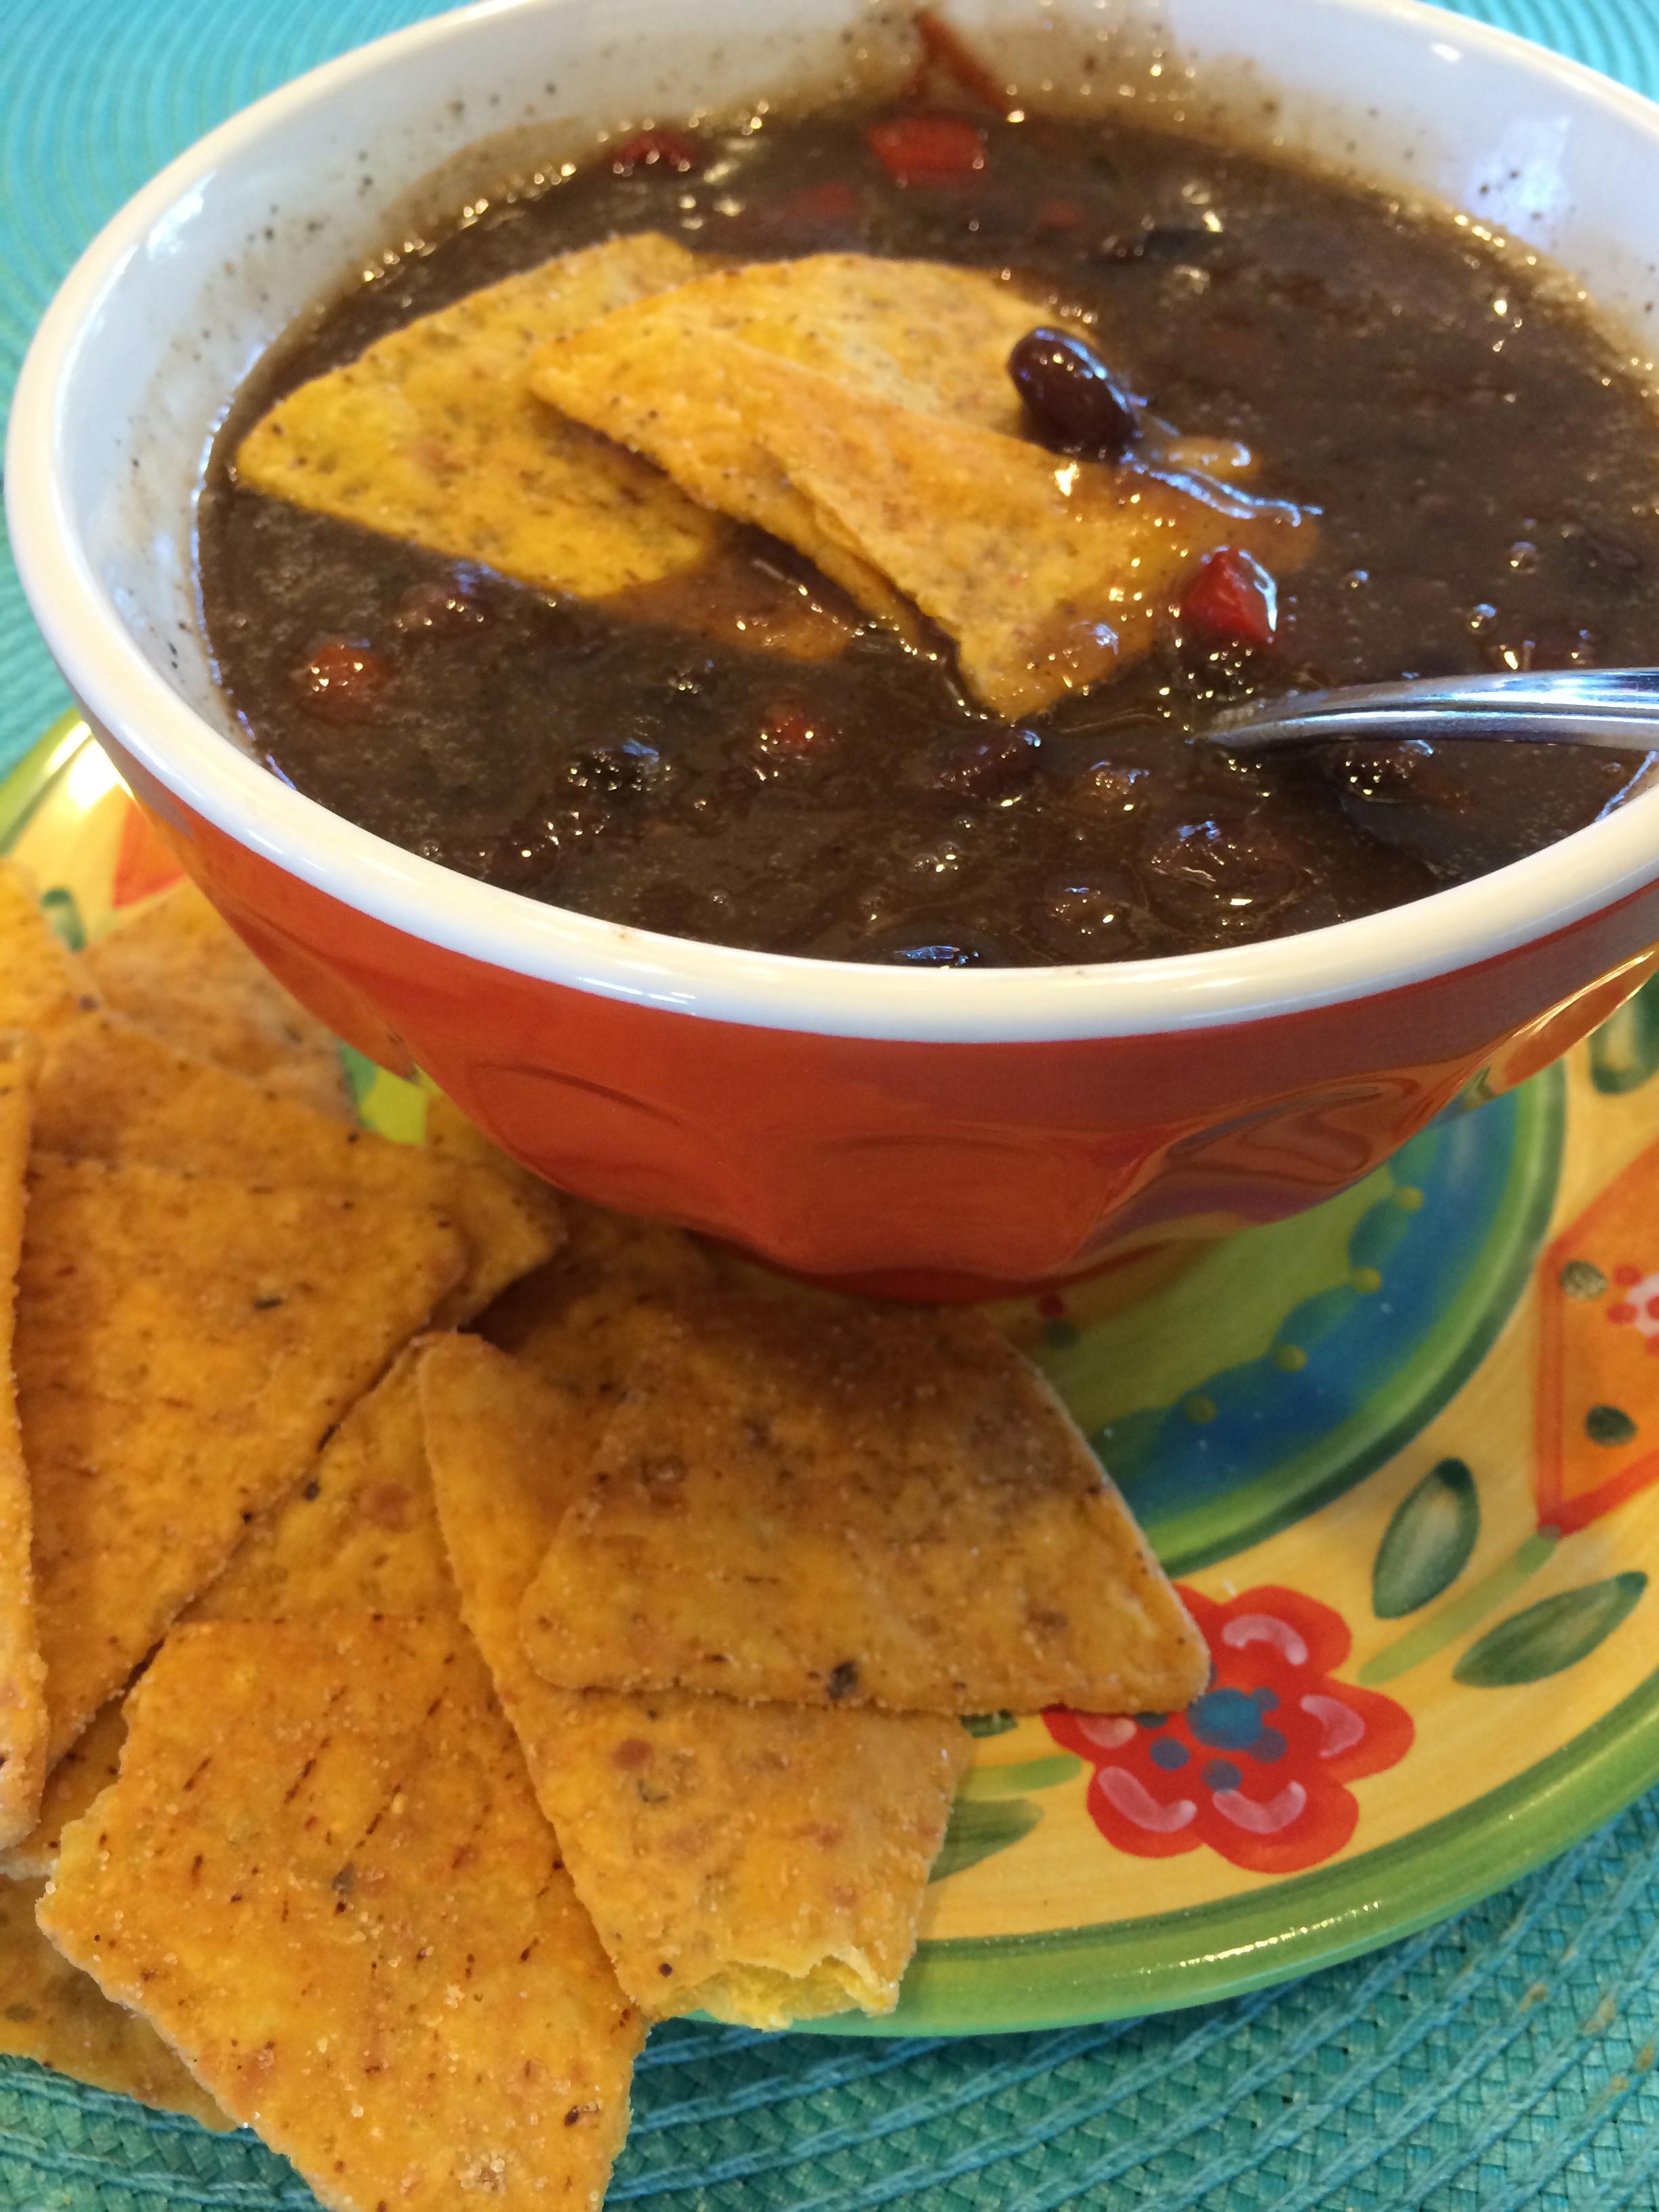 New Vegan Costco Products Vegan Southwestern Black Bean Soup And